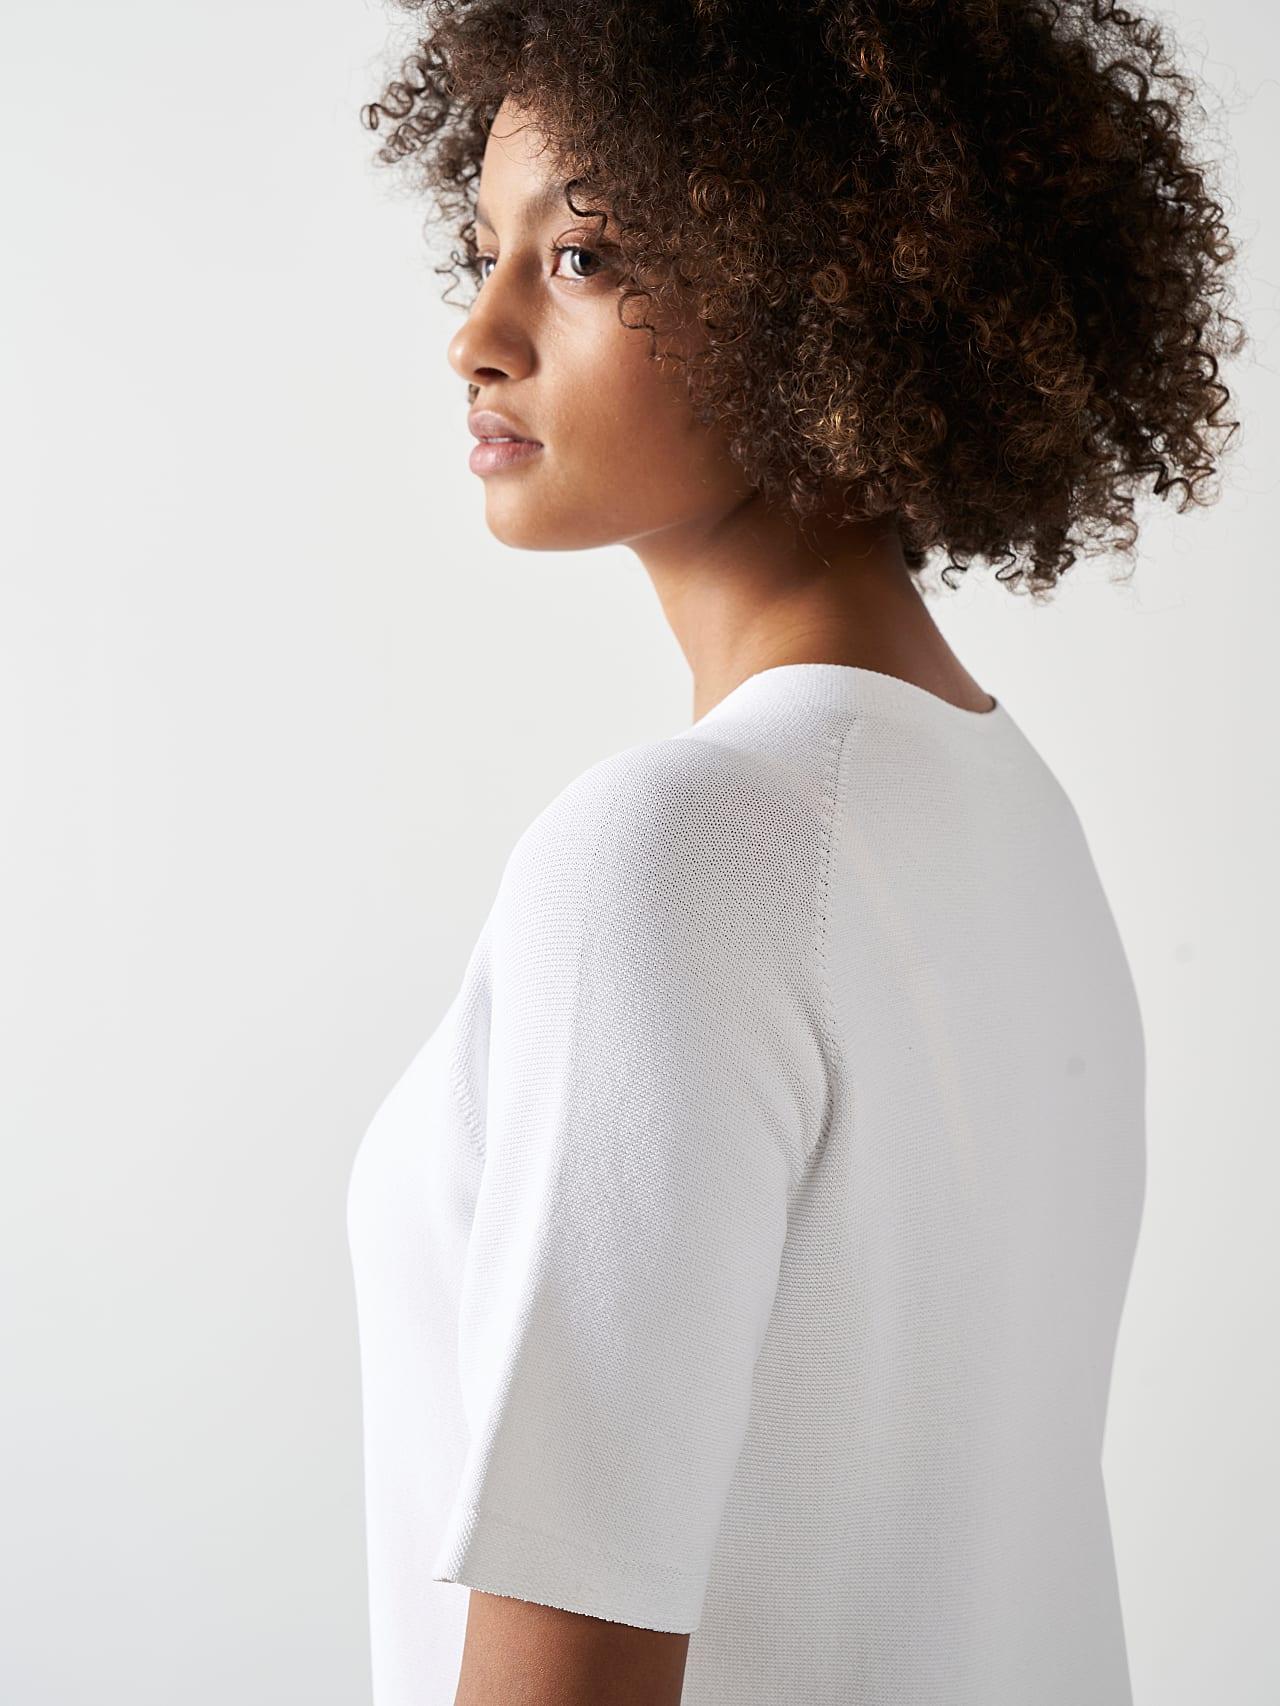 FZORF V1.Y5.01 Seamless Knit Dress white Right Alpha Tauri